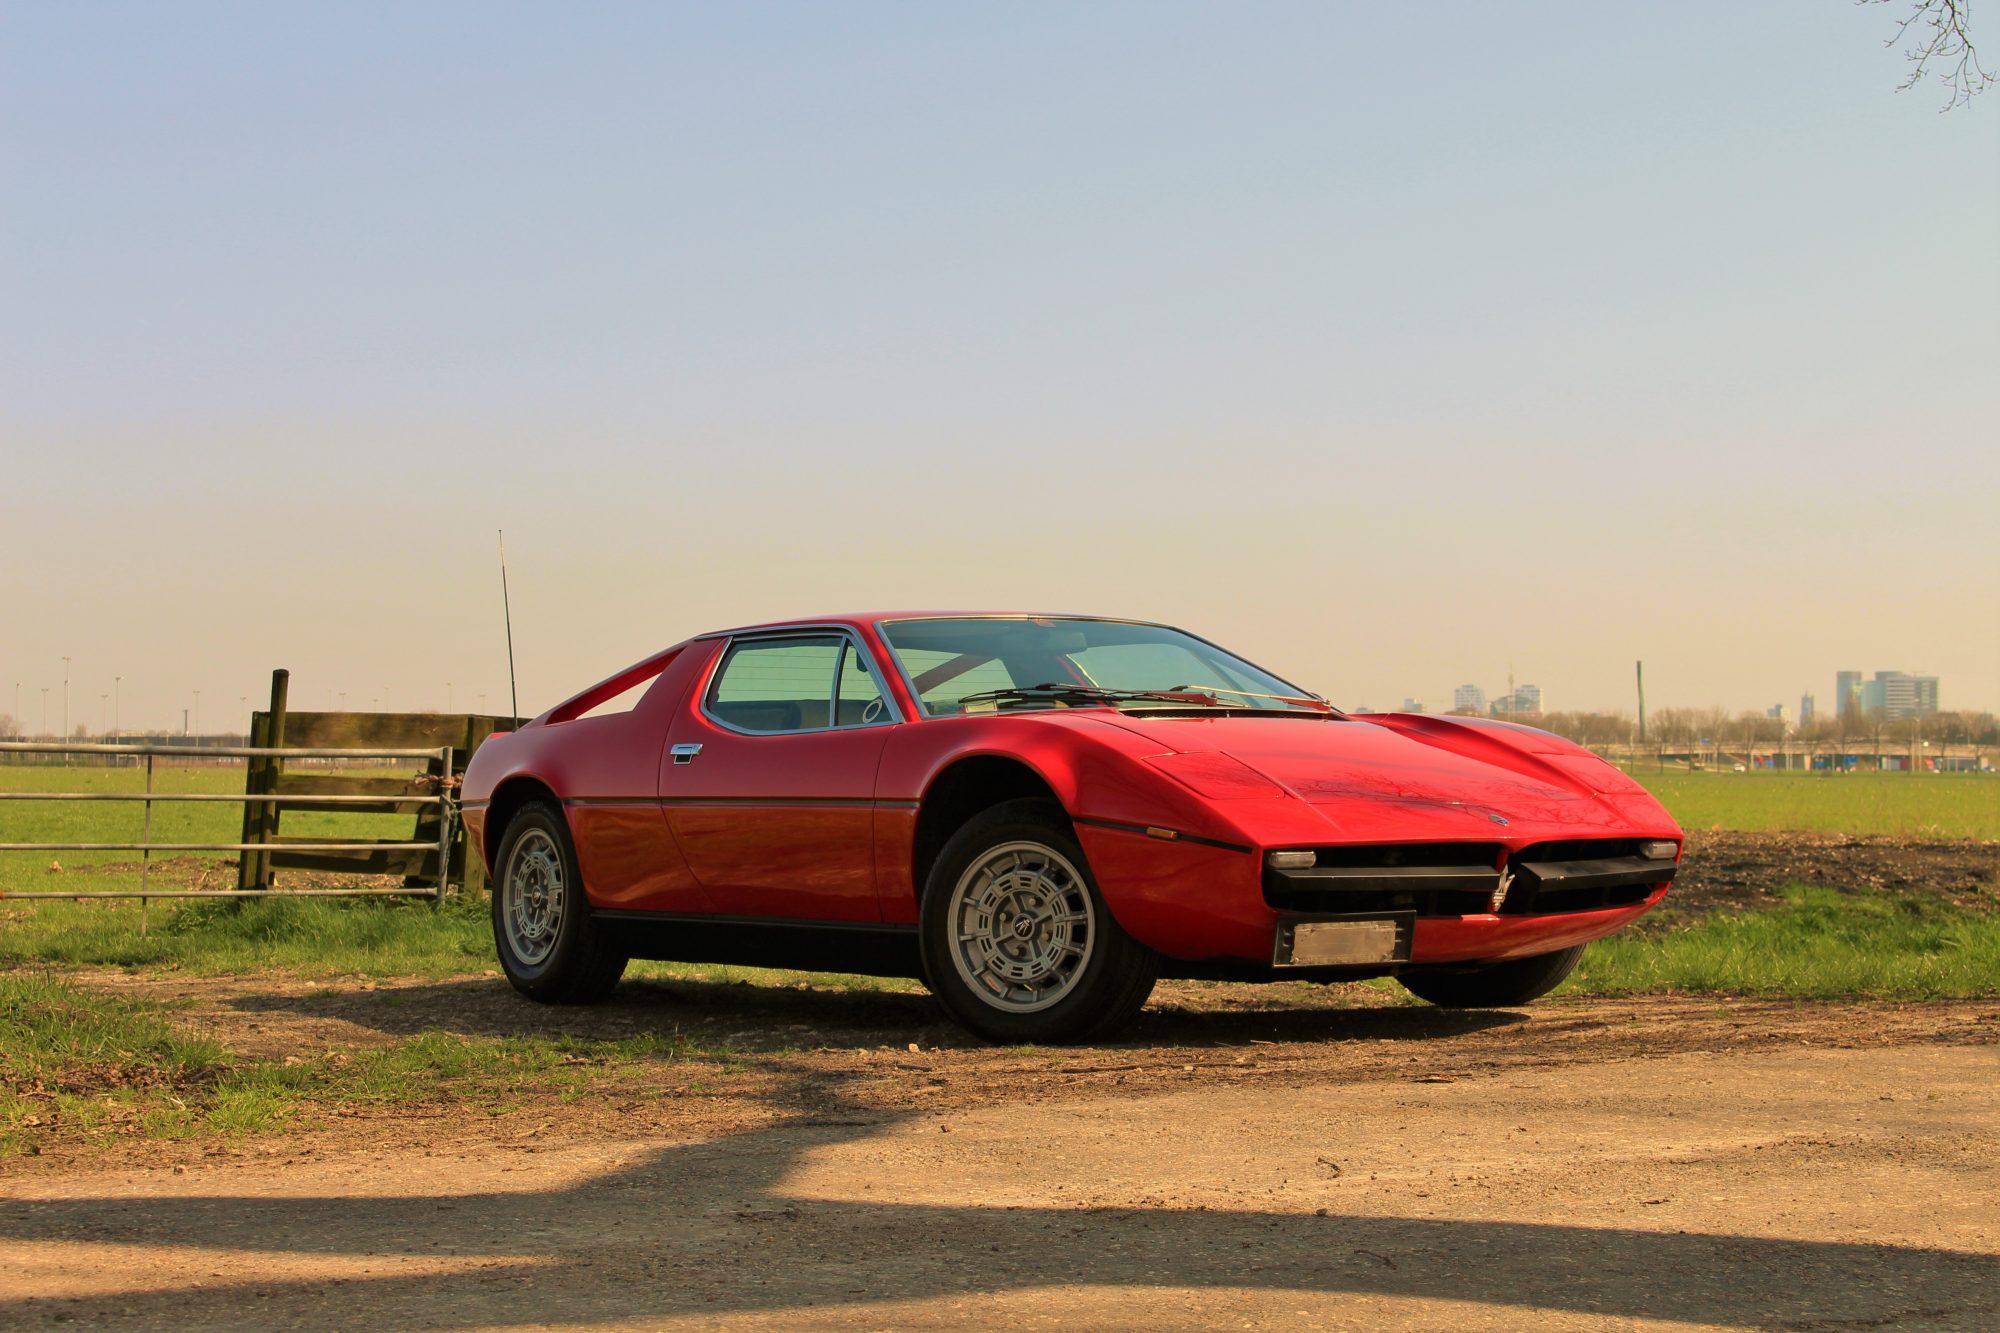 Maserati Merak 3.0 1974 - Classic Sports Cars Holland